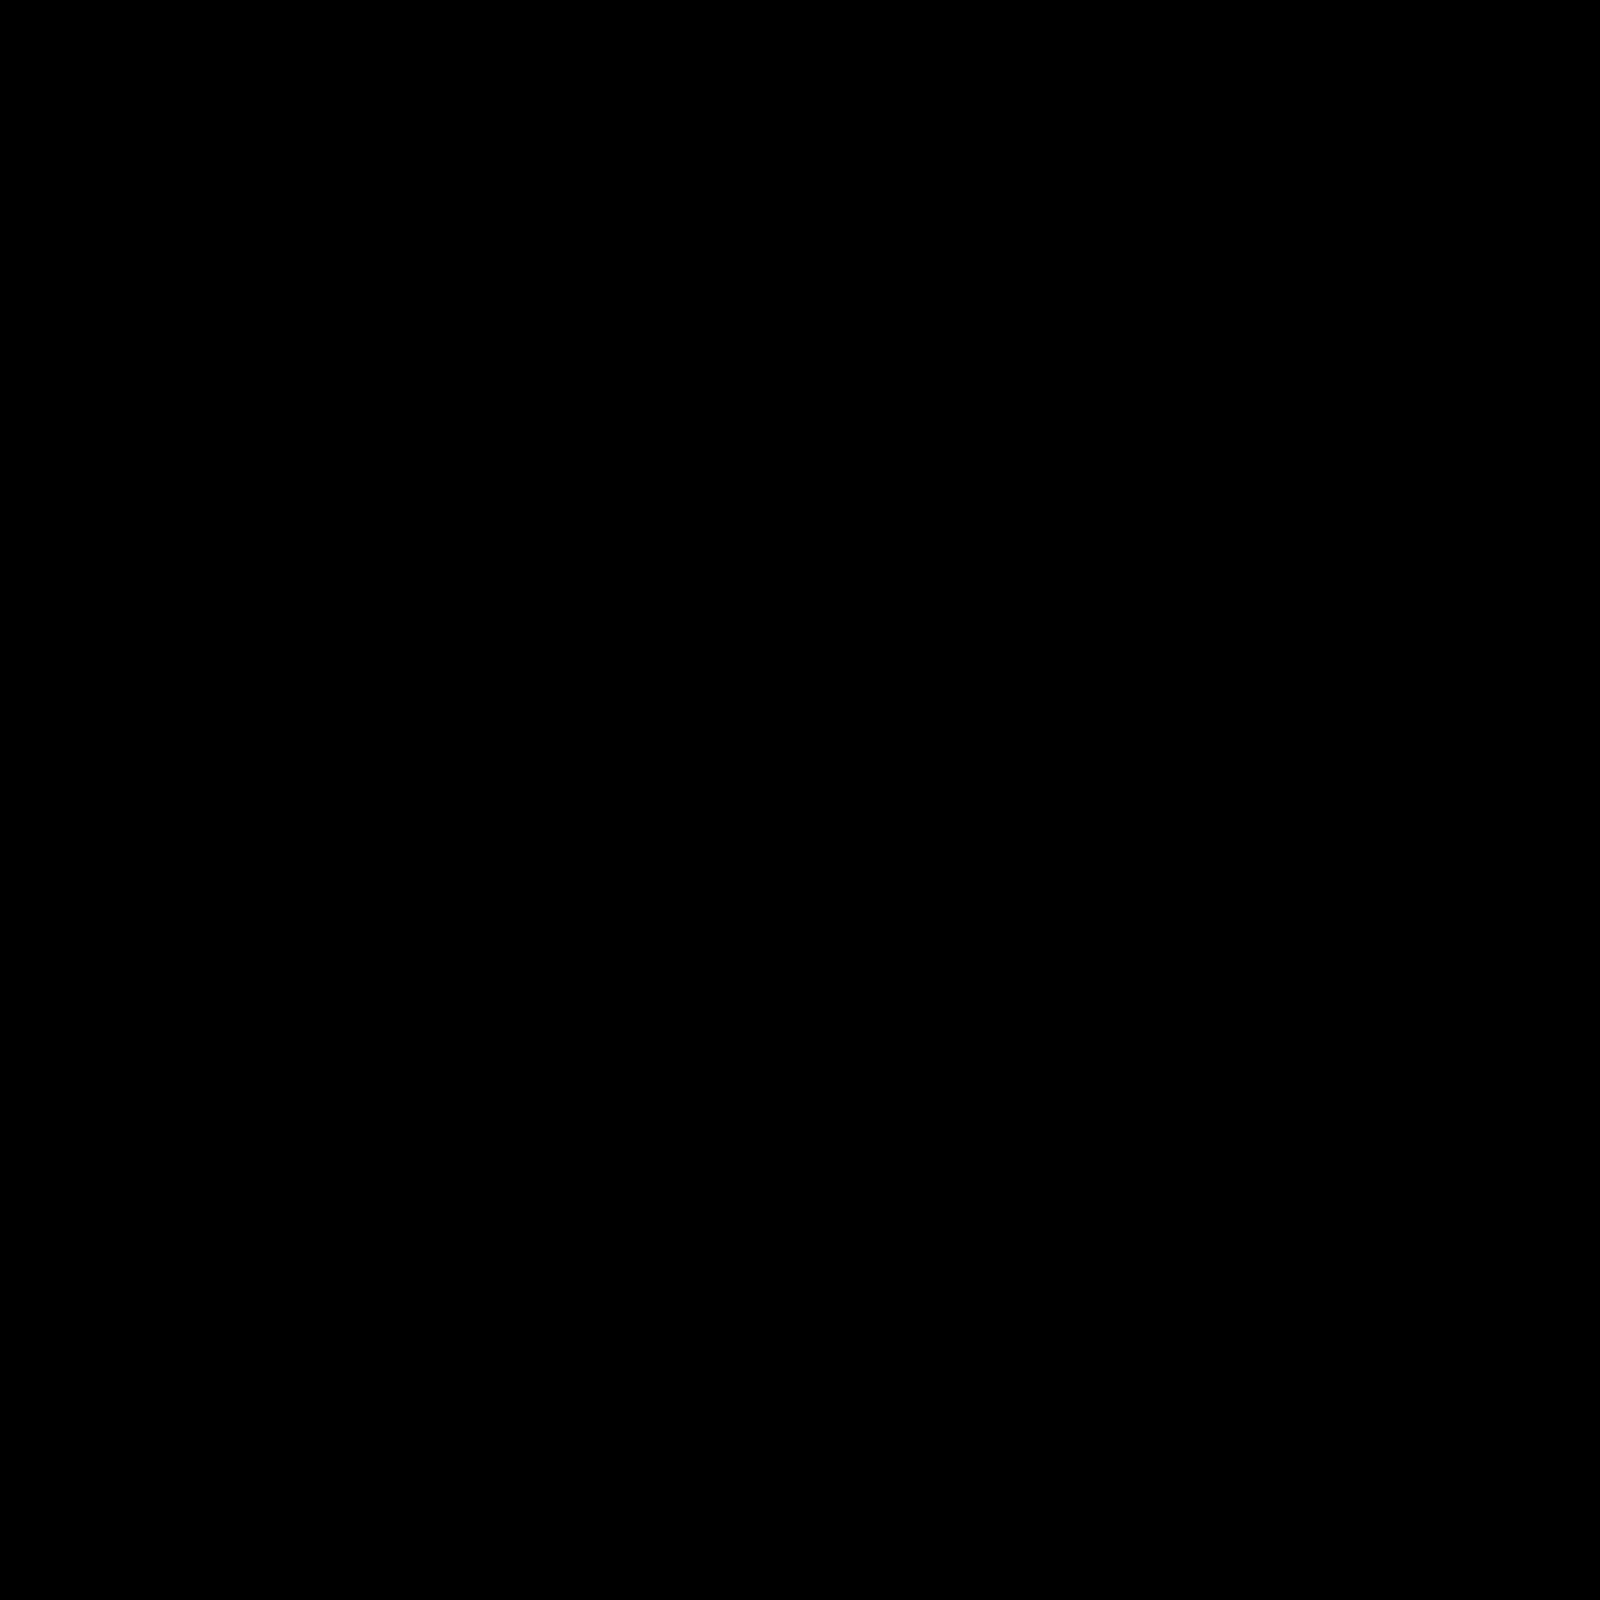 Invert Colors off icon